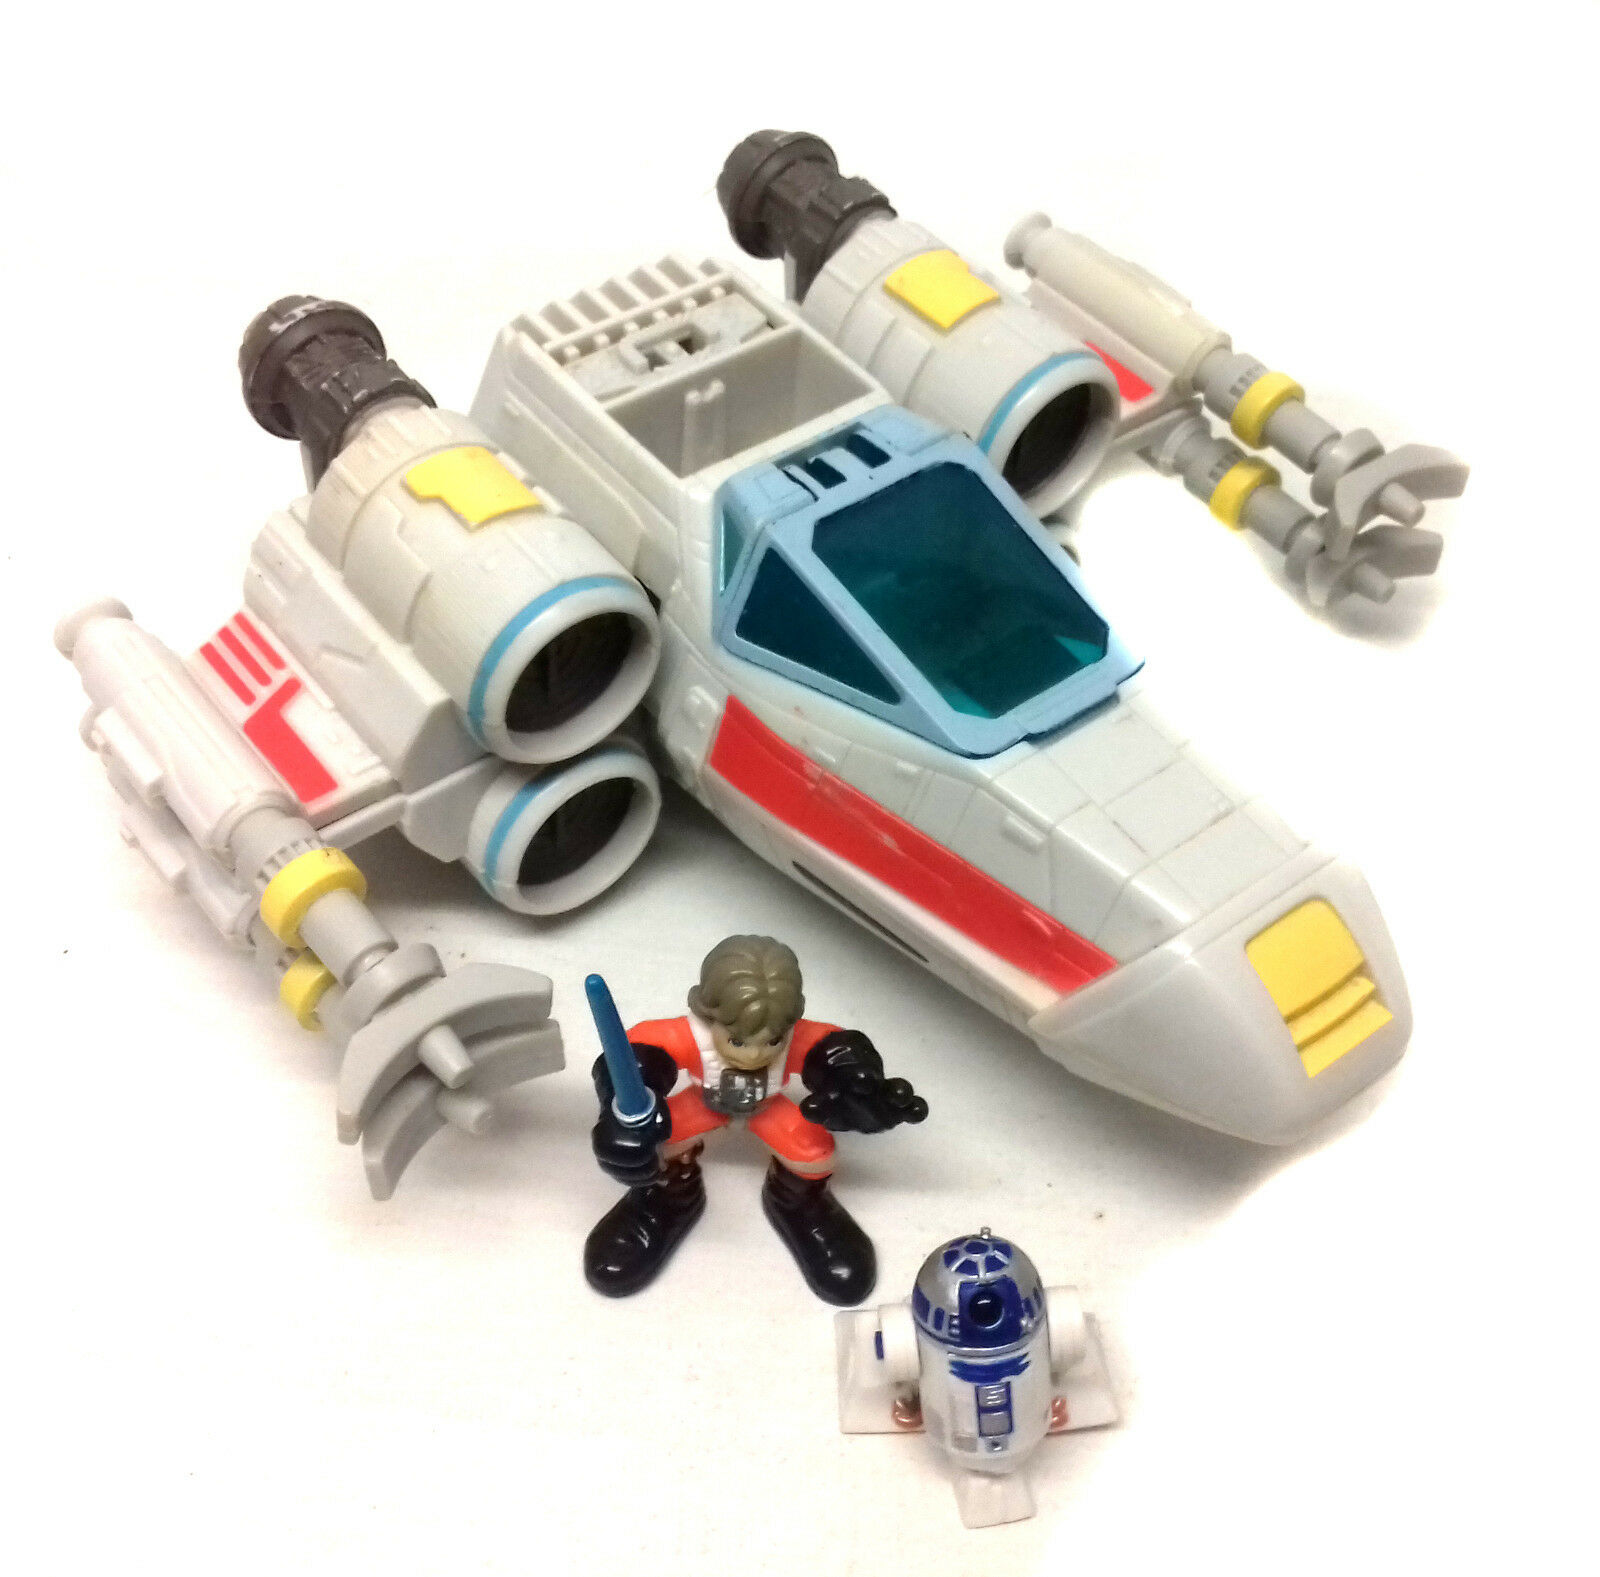 Star Wars Galactic Galactic Galactic Heroes Playskool X WING FIGHTER vehicle toy + LUKE toy figure 1750bf